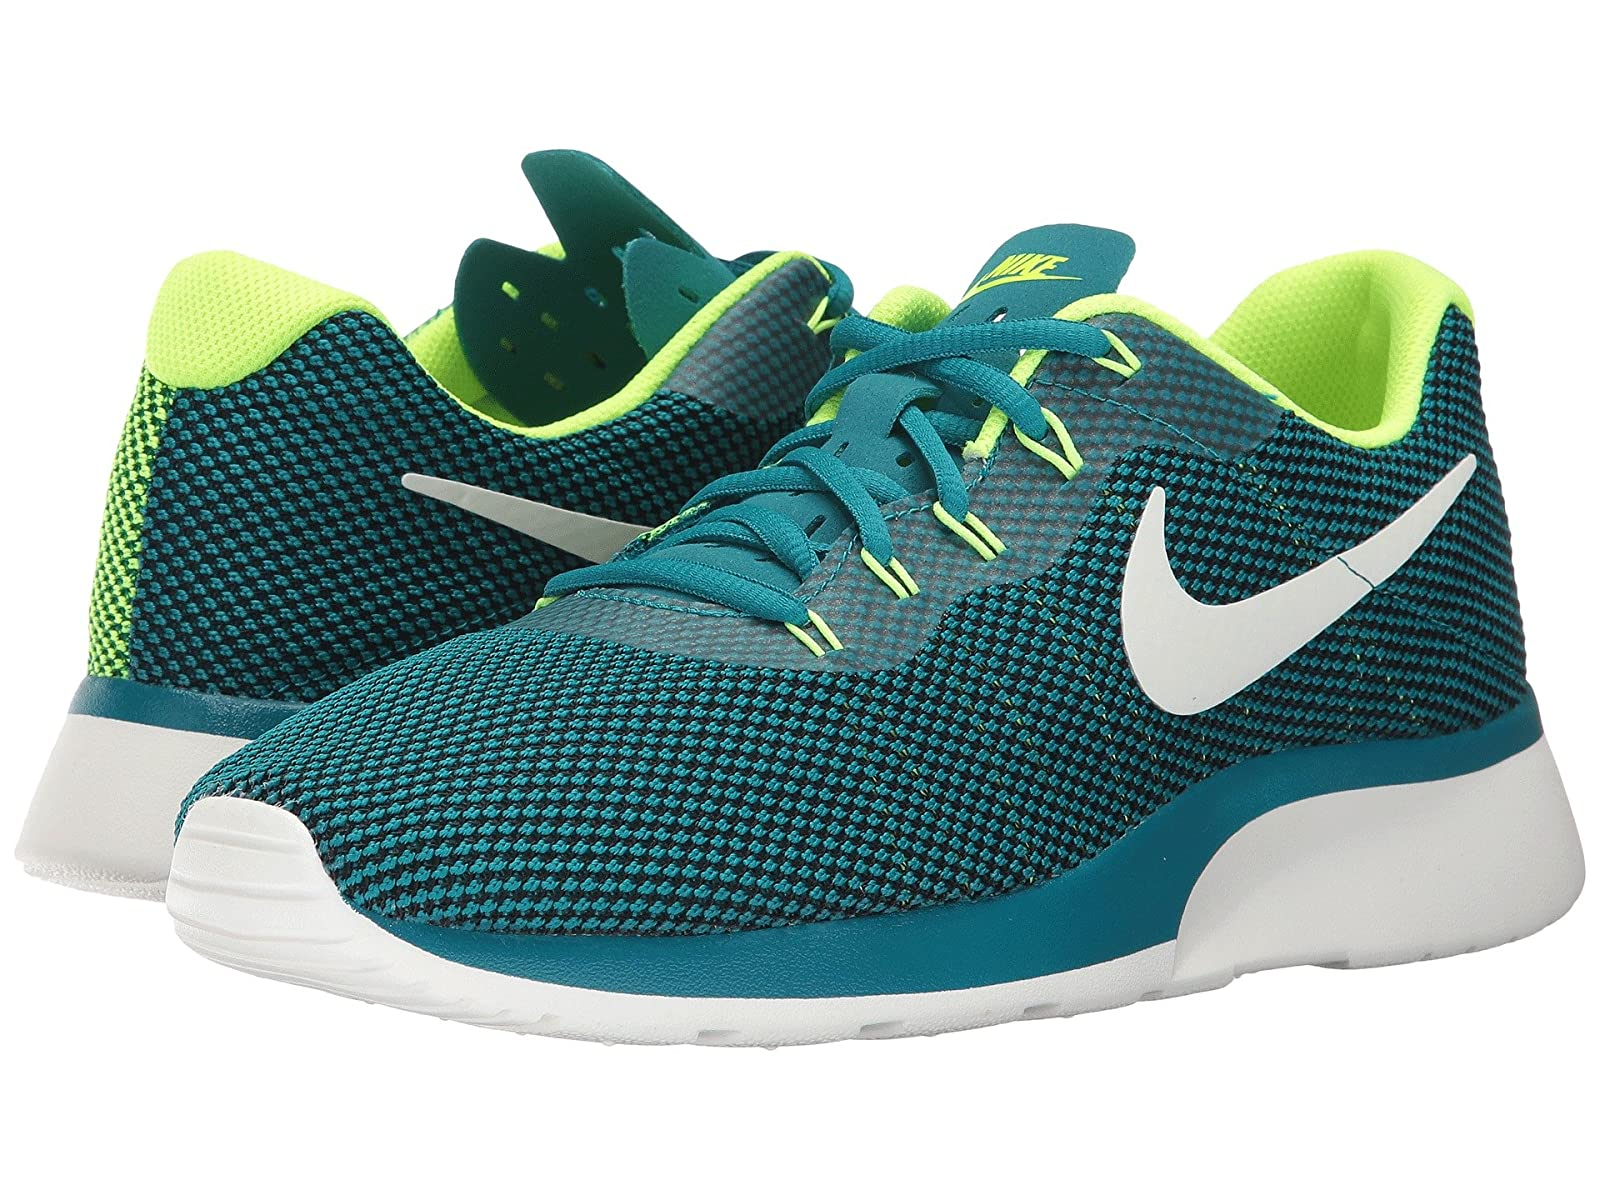 Nike Tanjun RacerCheap and distinctive eye-catching shoes